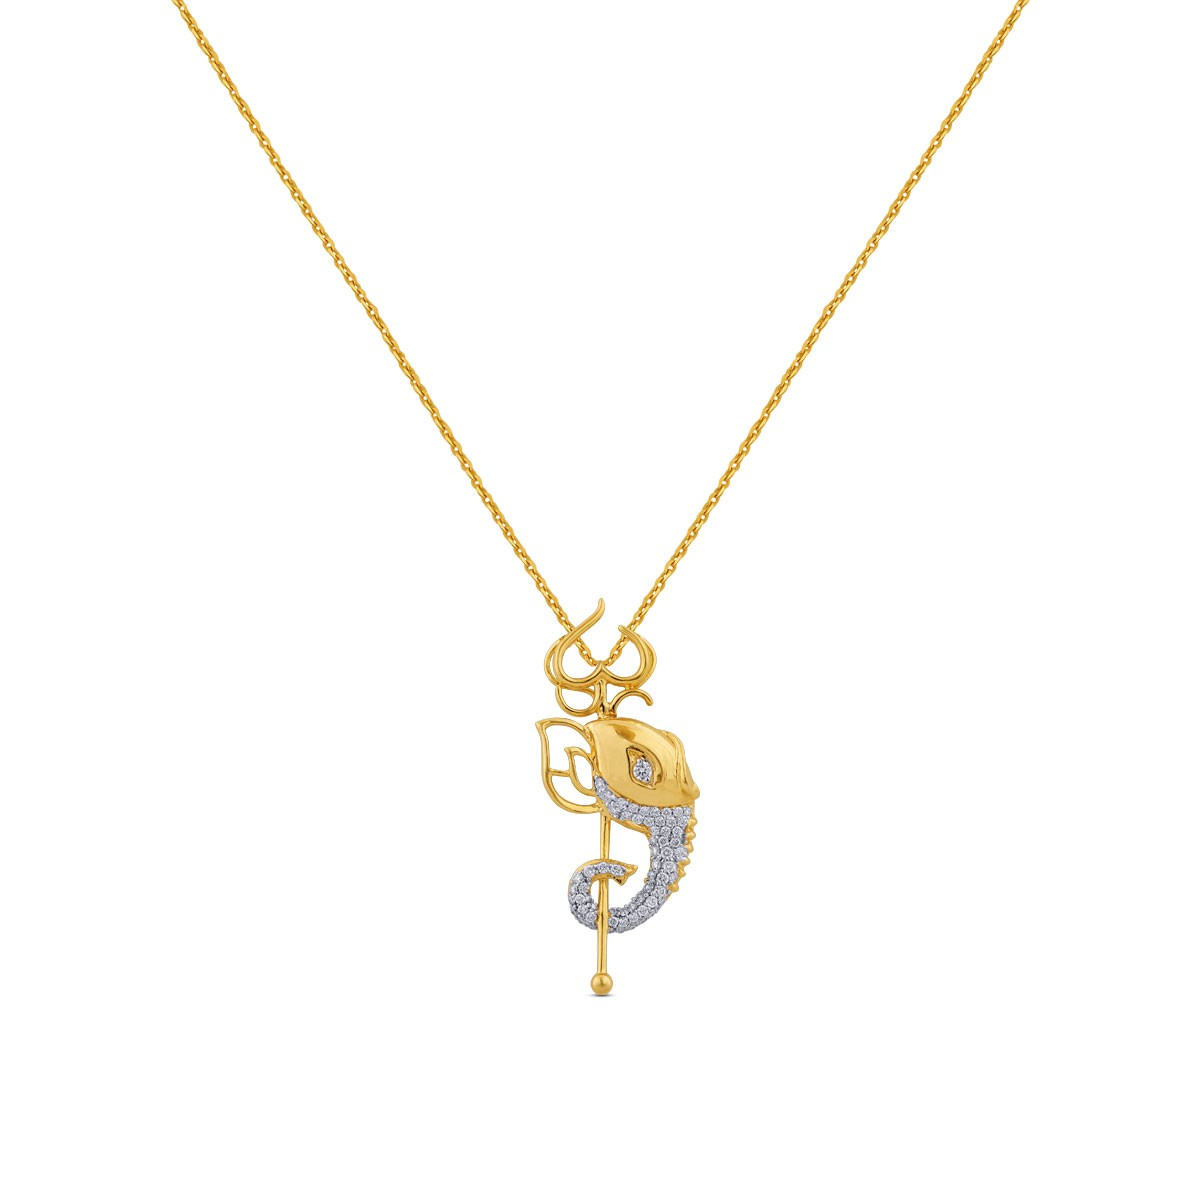 Pooja Yellow Gold Diamond Pendant with Chain